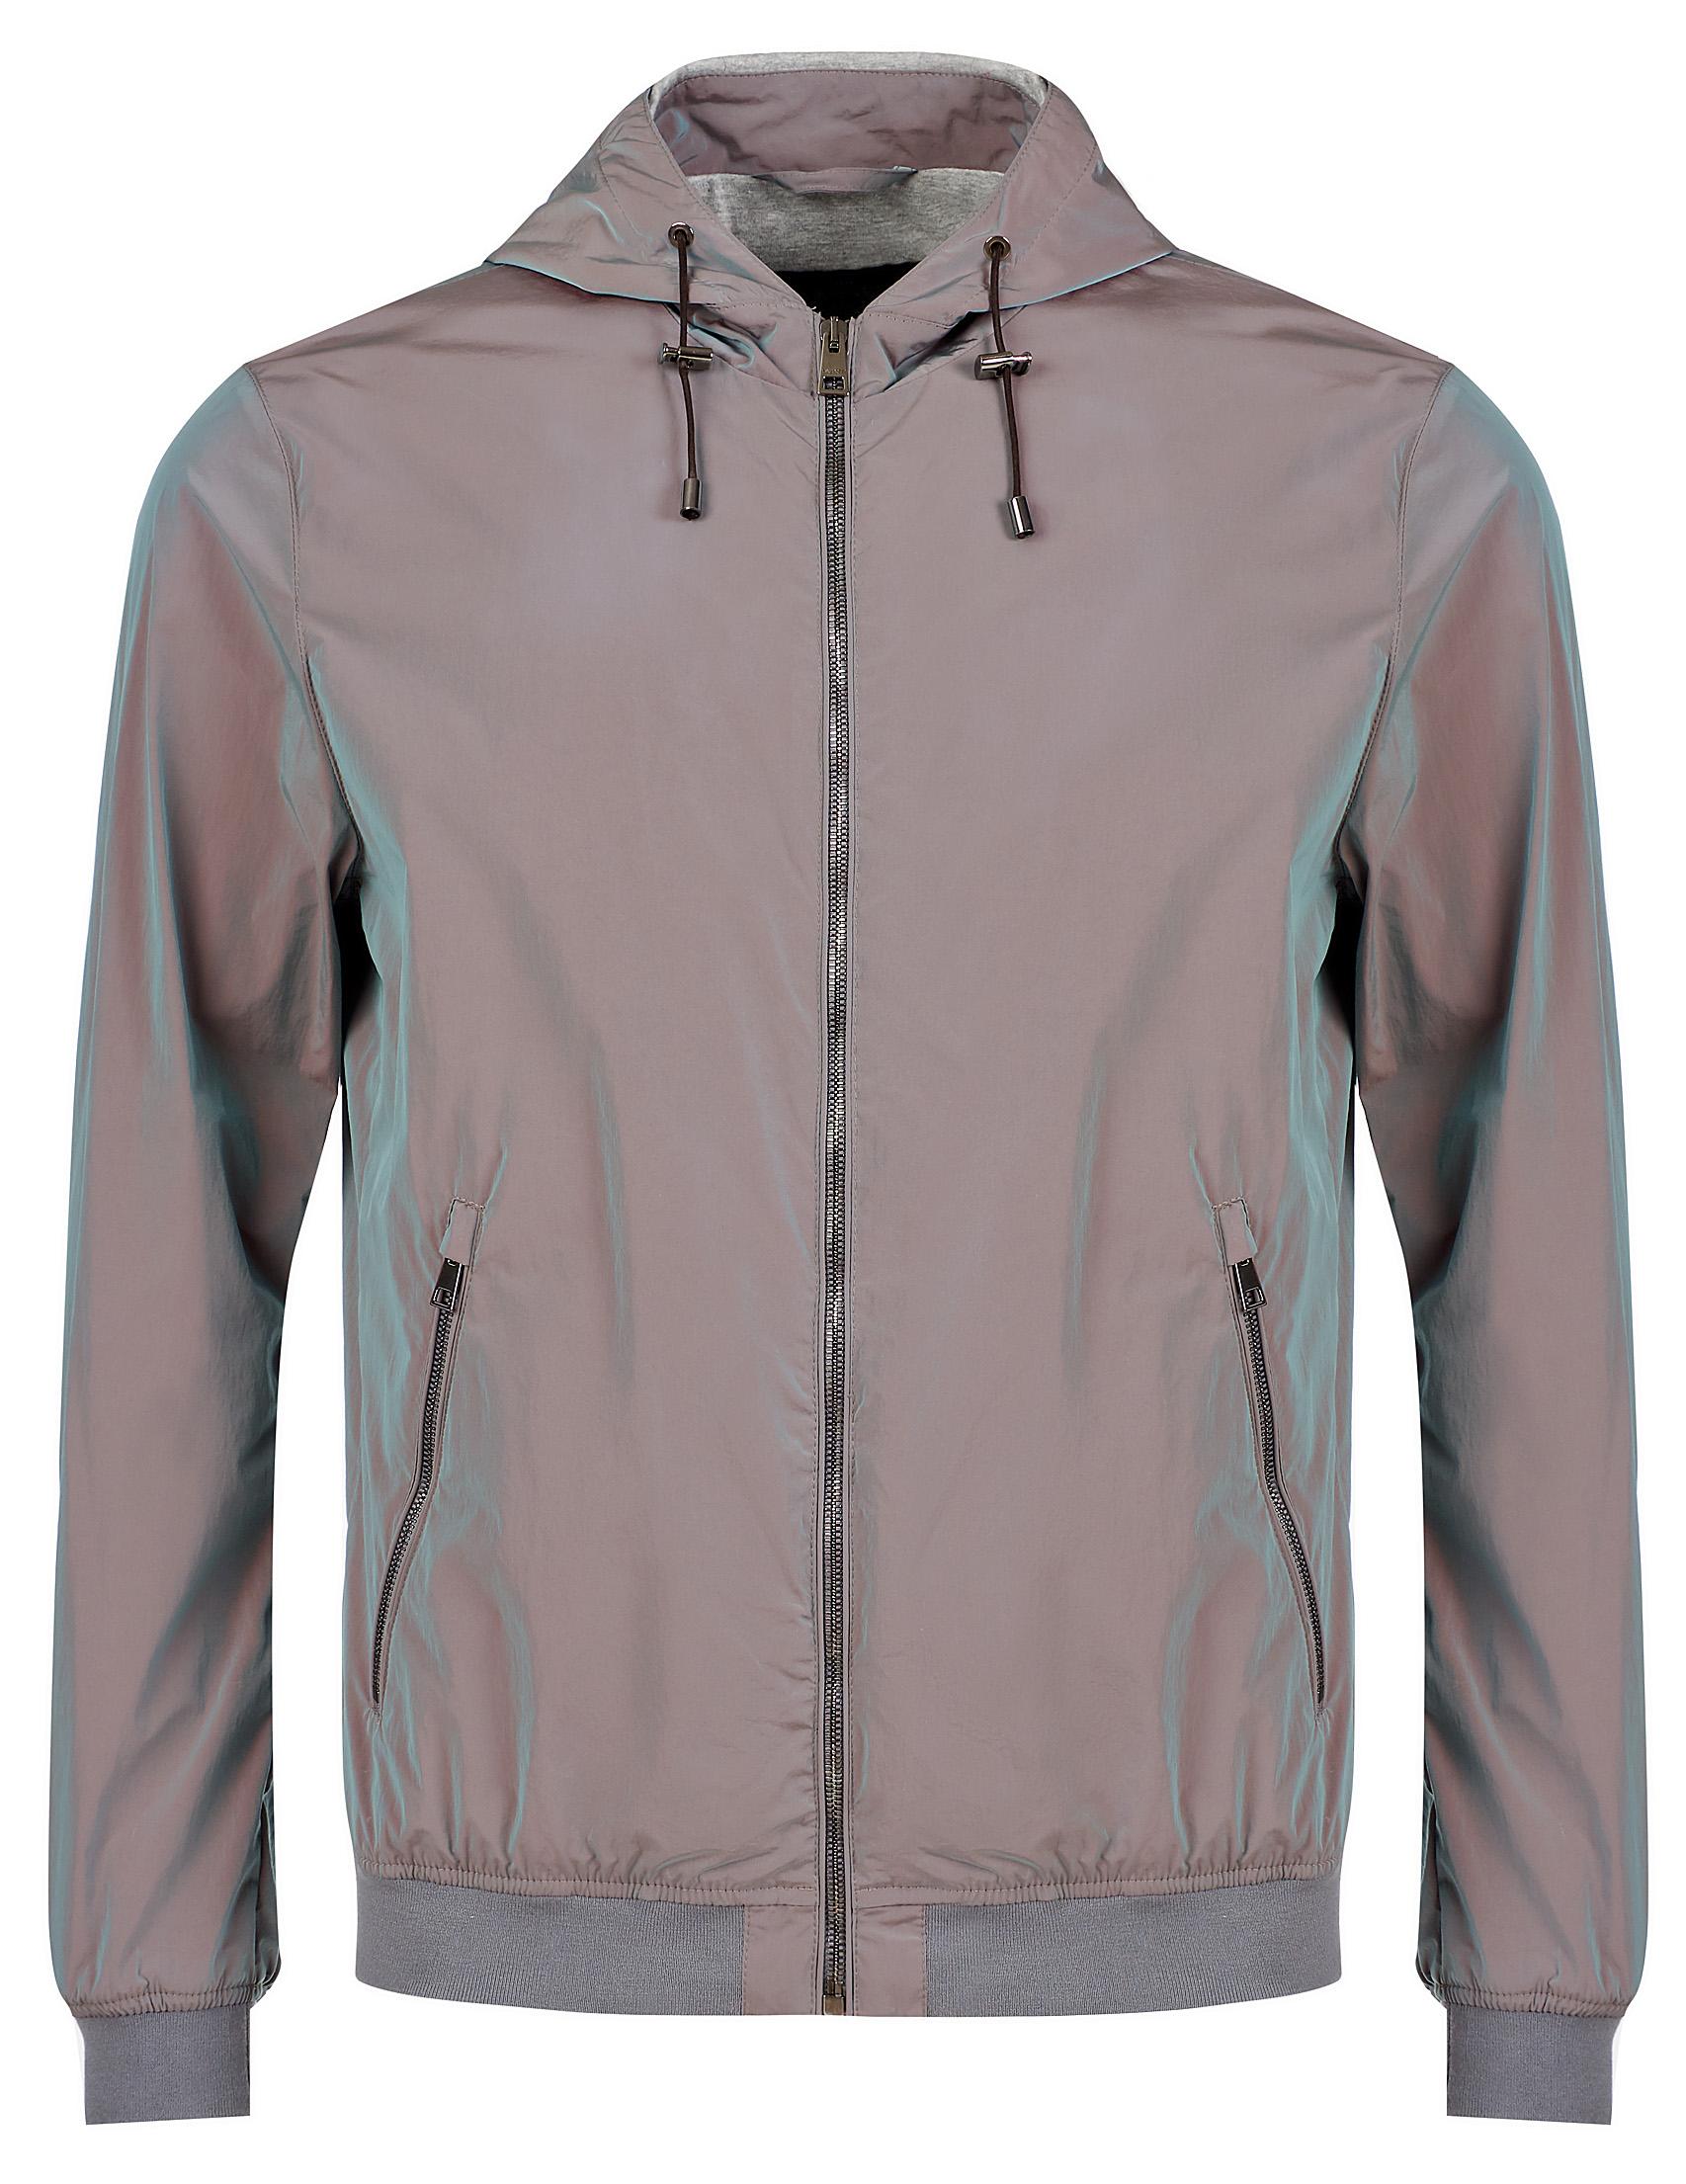 Купить Куртки, Куртка, GALLOTTI, Серый, 100%Полиамид;50%Хлопок 50%Модал, Осень-Зима